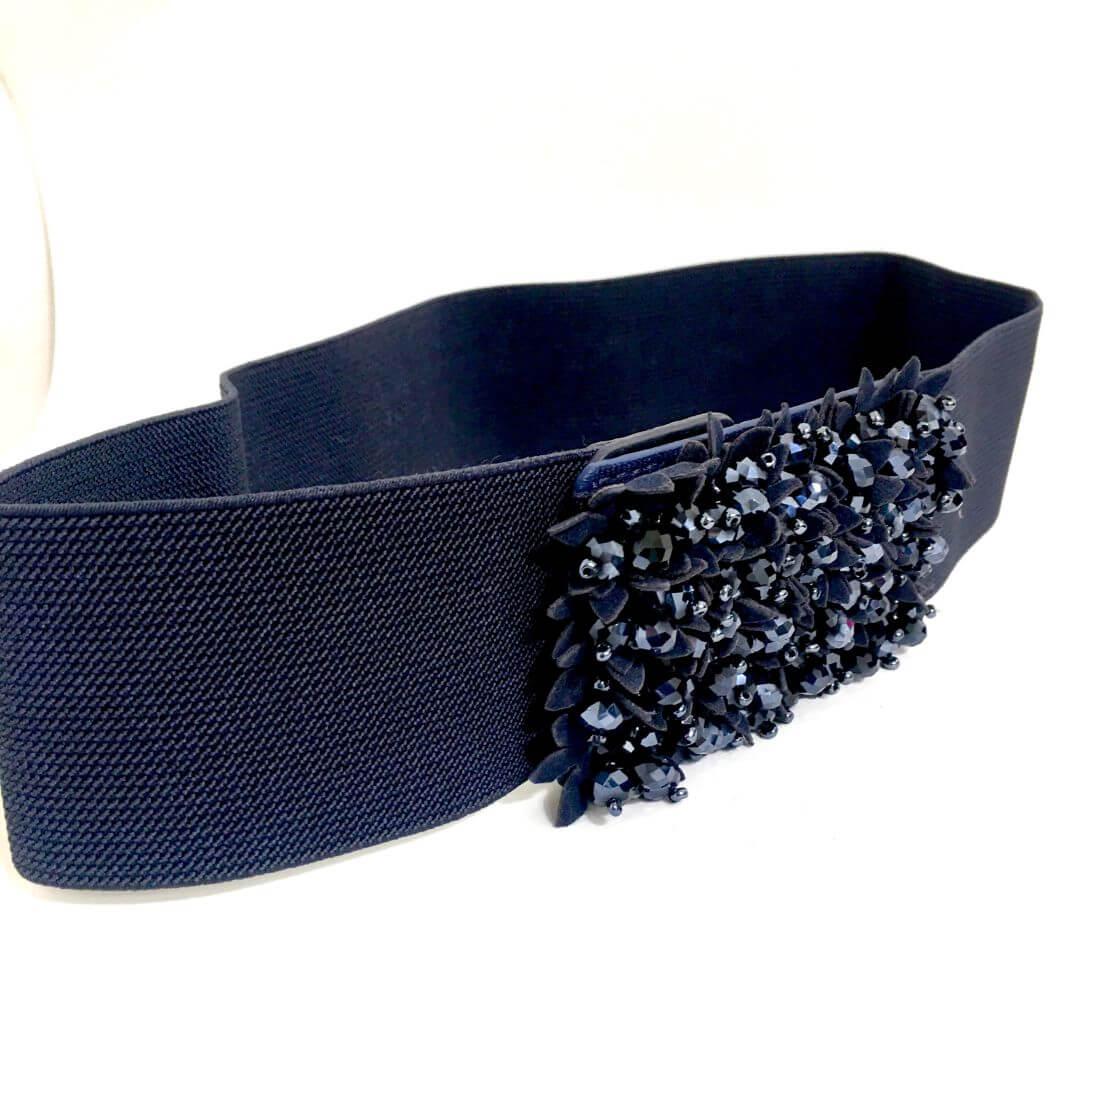 design innovativo daae9 ecbad Cintura elastica alta blu